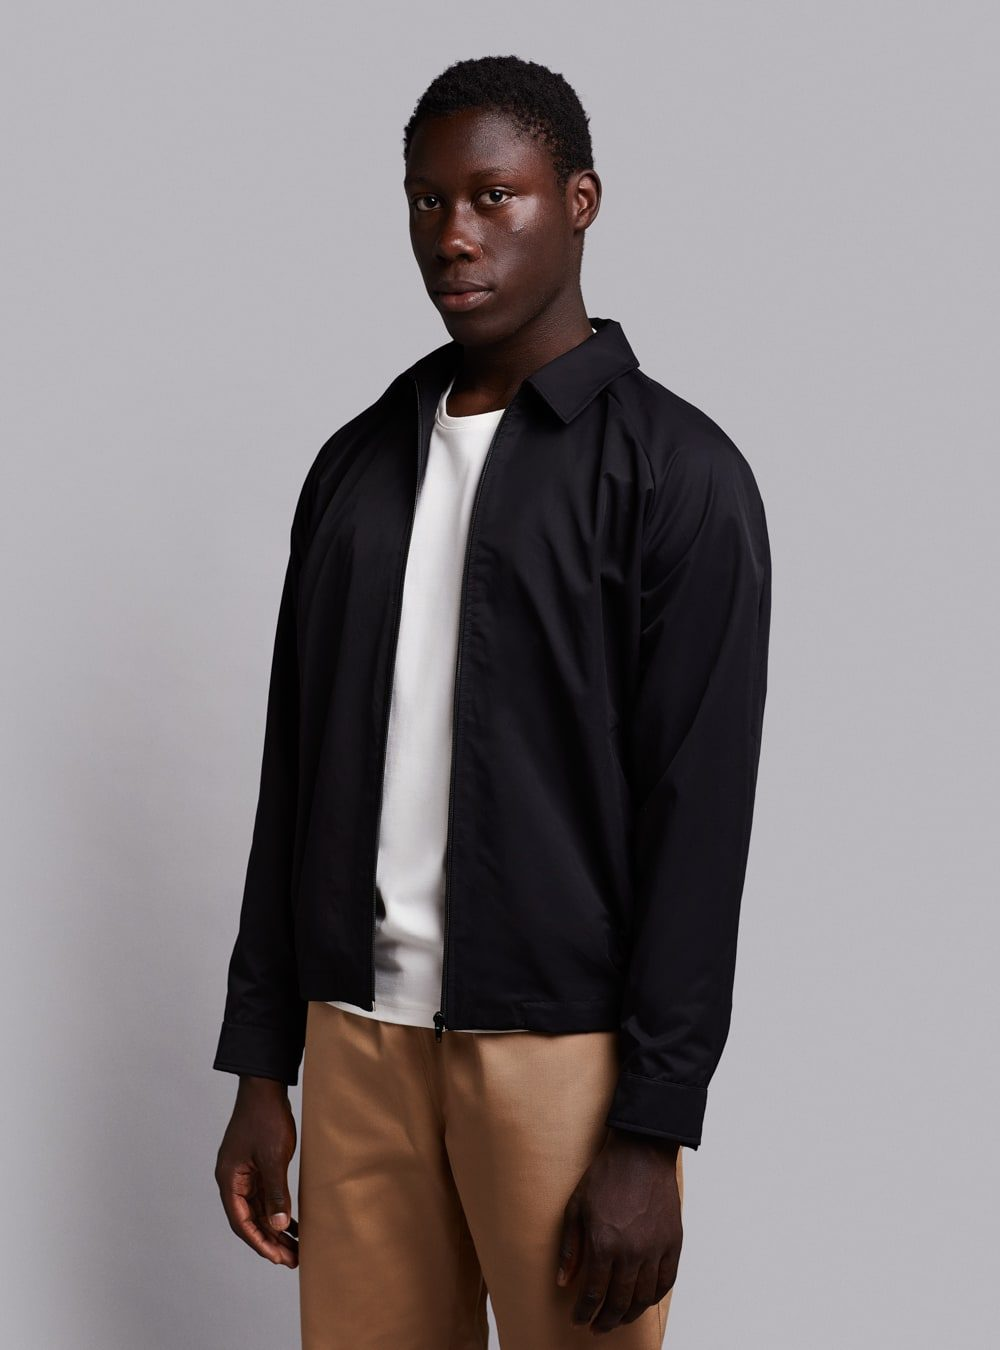 Harrington jacket (lightweight) in black, made in Portugal by wetheknot.